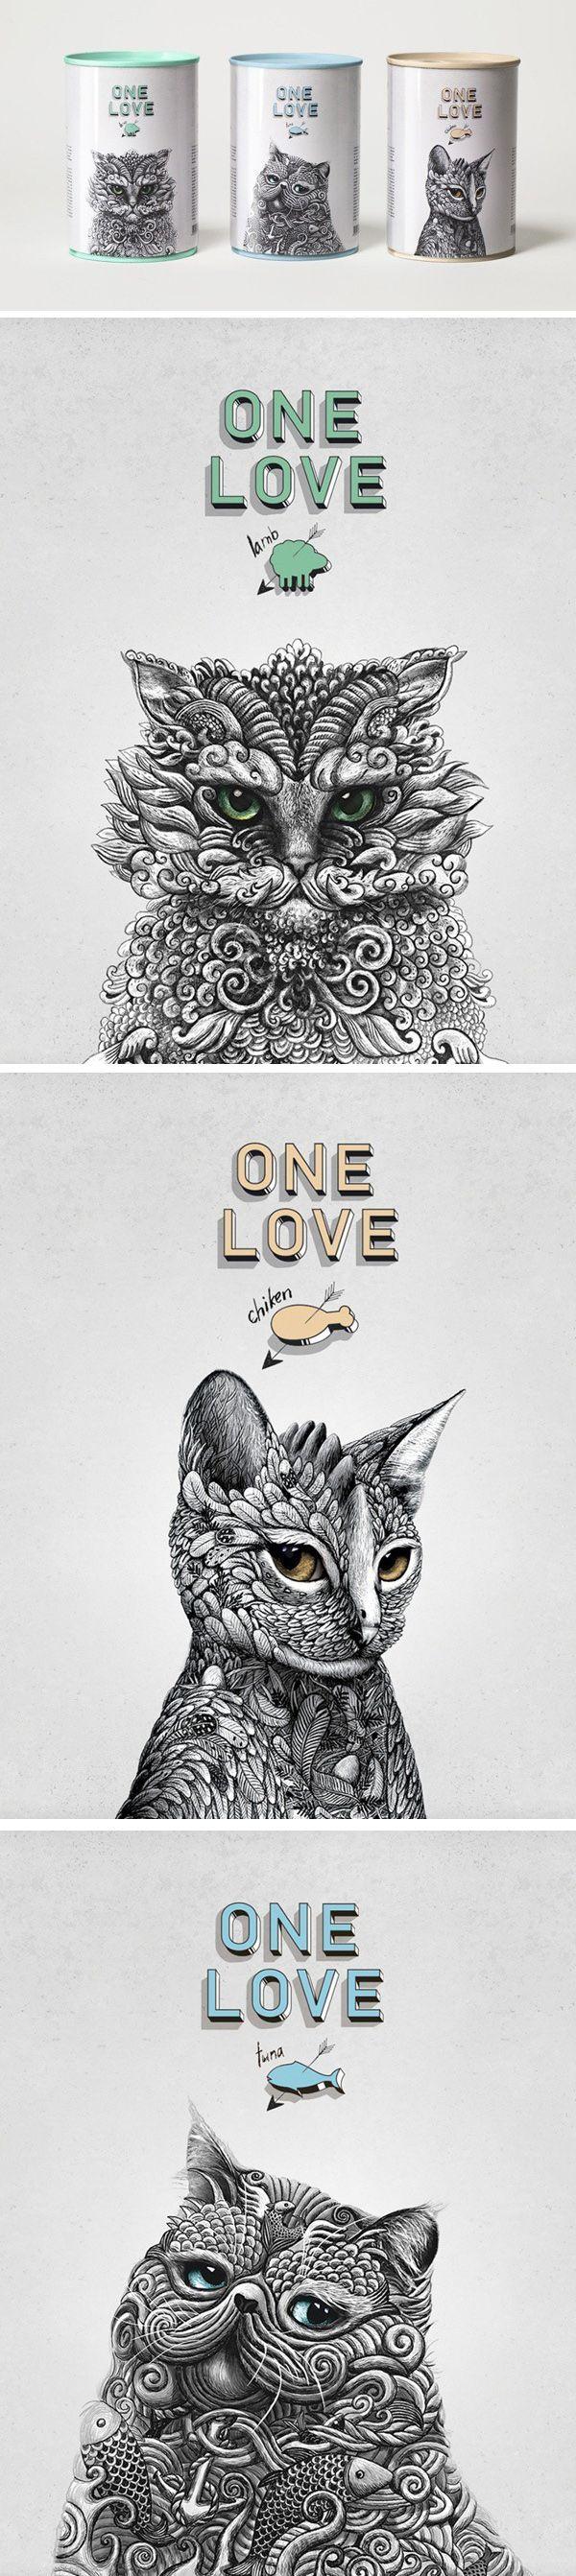 ONE LOVE Cat food Design #Cat lovers - Join http://facebook.com/OzziCat * Get cat #magazine http://OzziCat.com.au